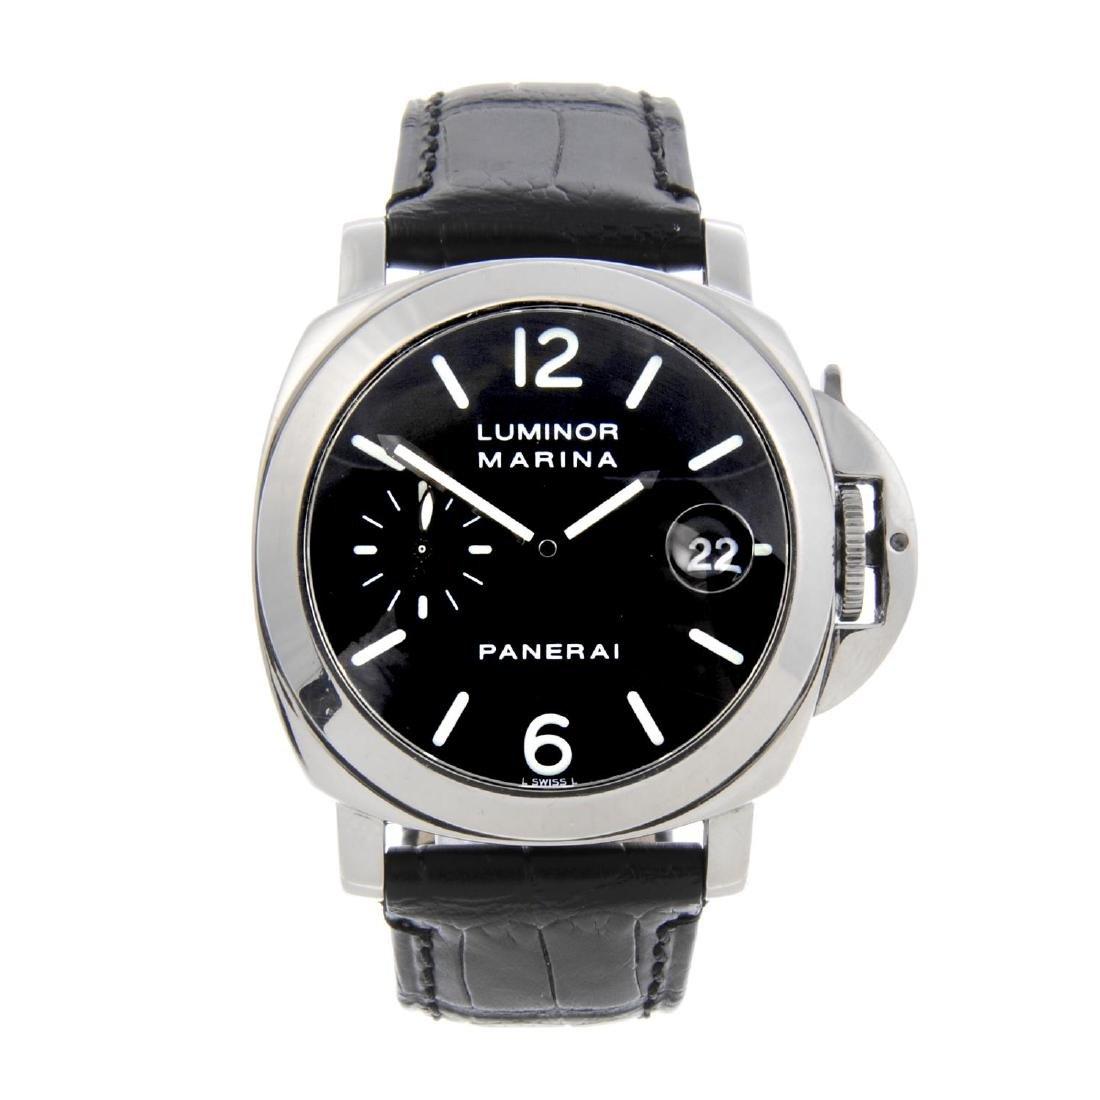 PANERAI - a gentleman's Marina wrist watch. Circa 1999.